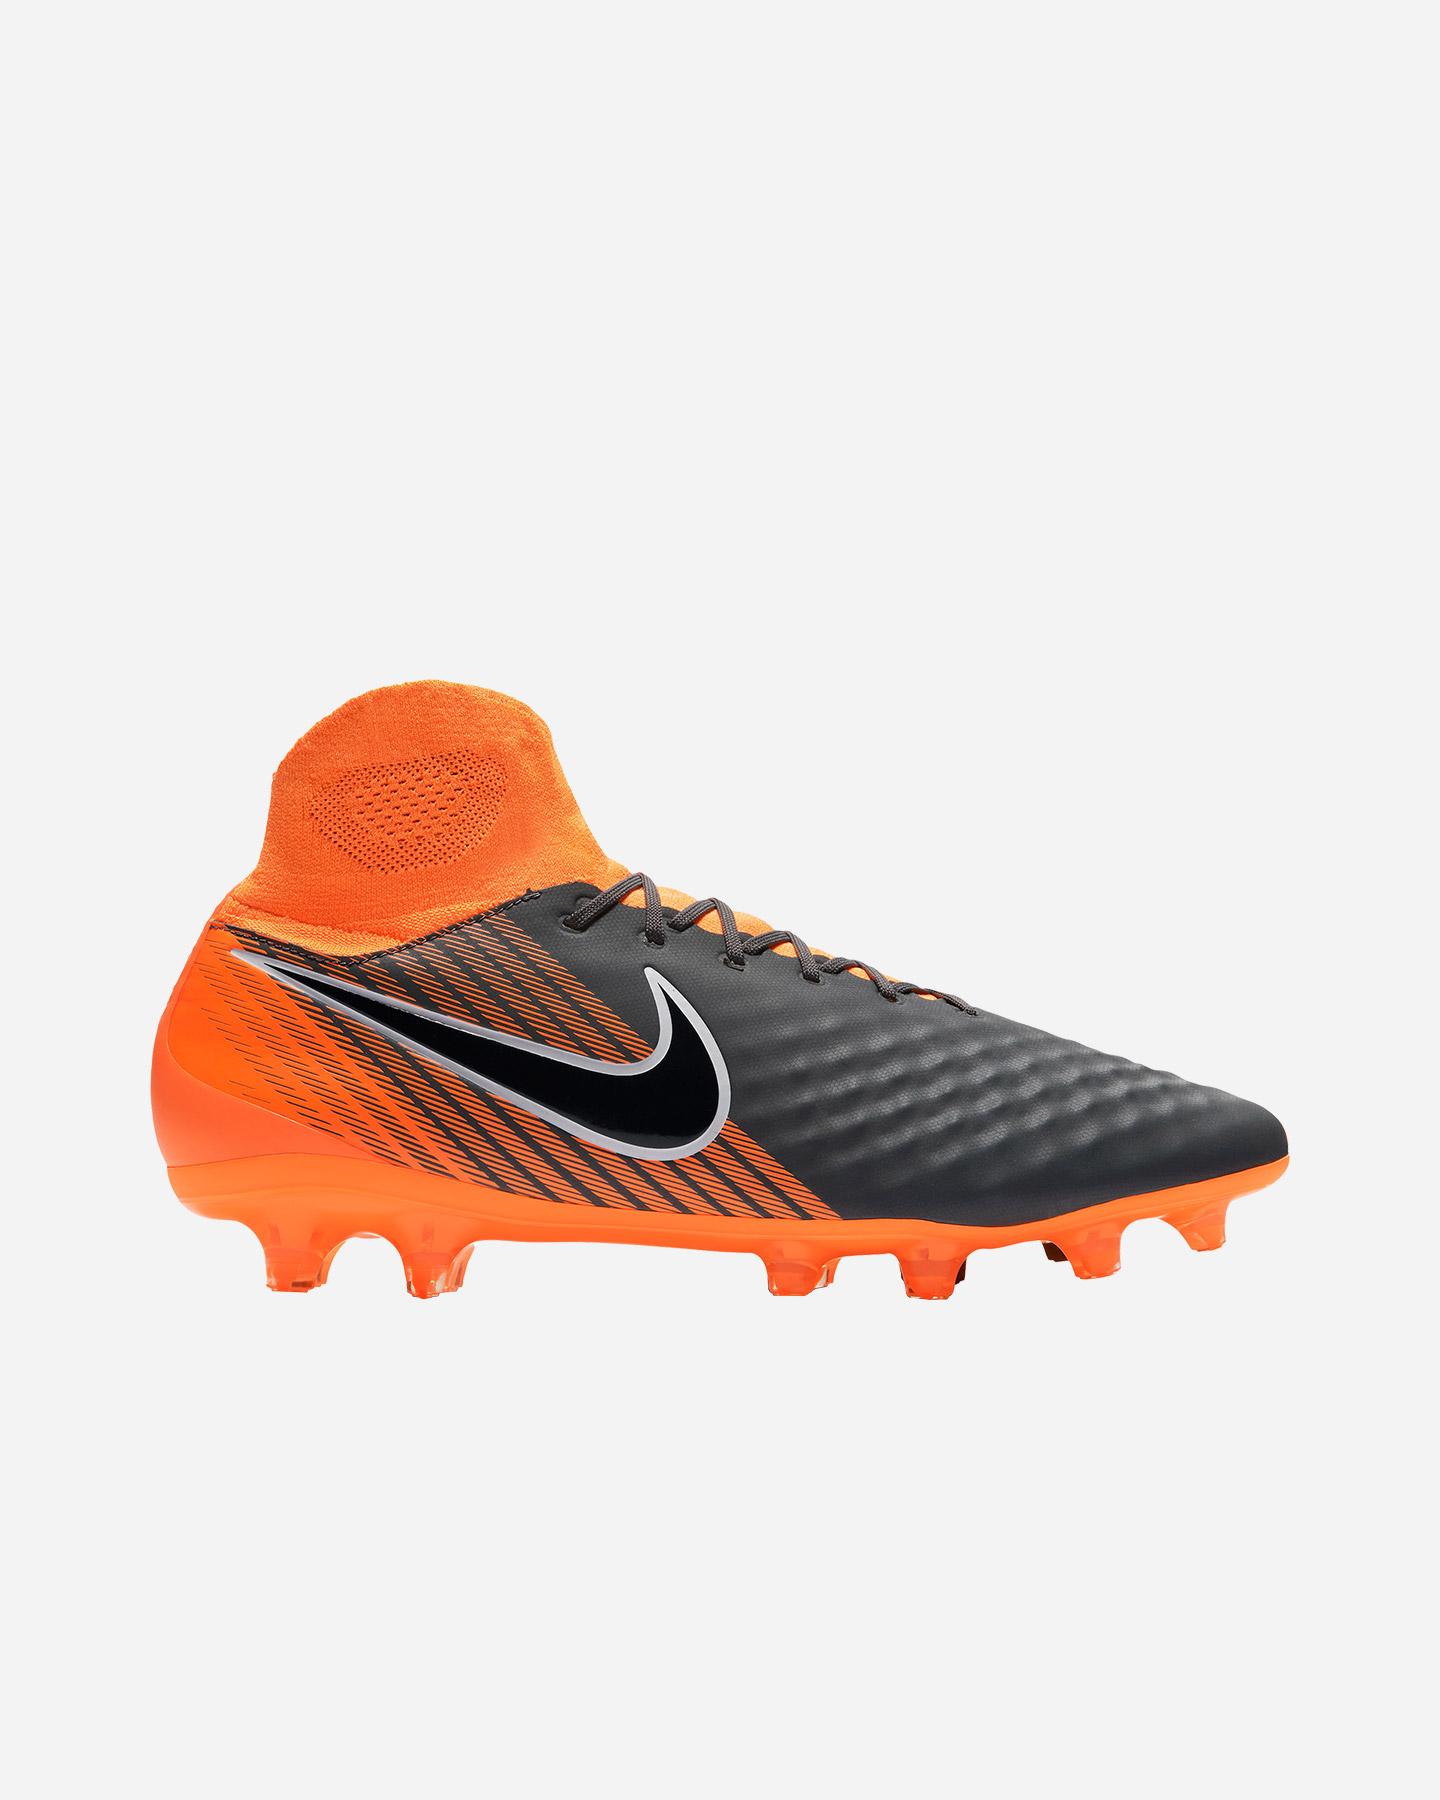 a775a8204 Scarpe Calcio Nike Magista Obra Ii Academy Df Fg M AH7308-080 ...